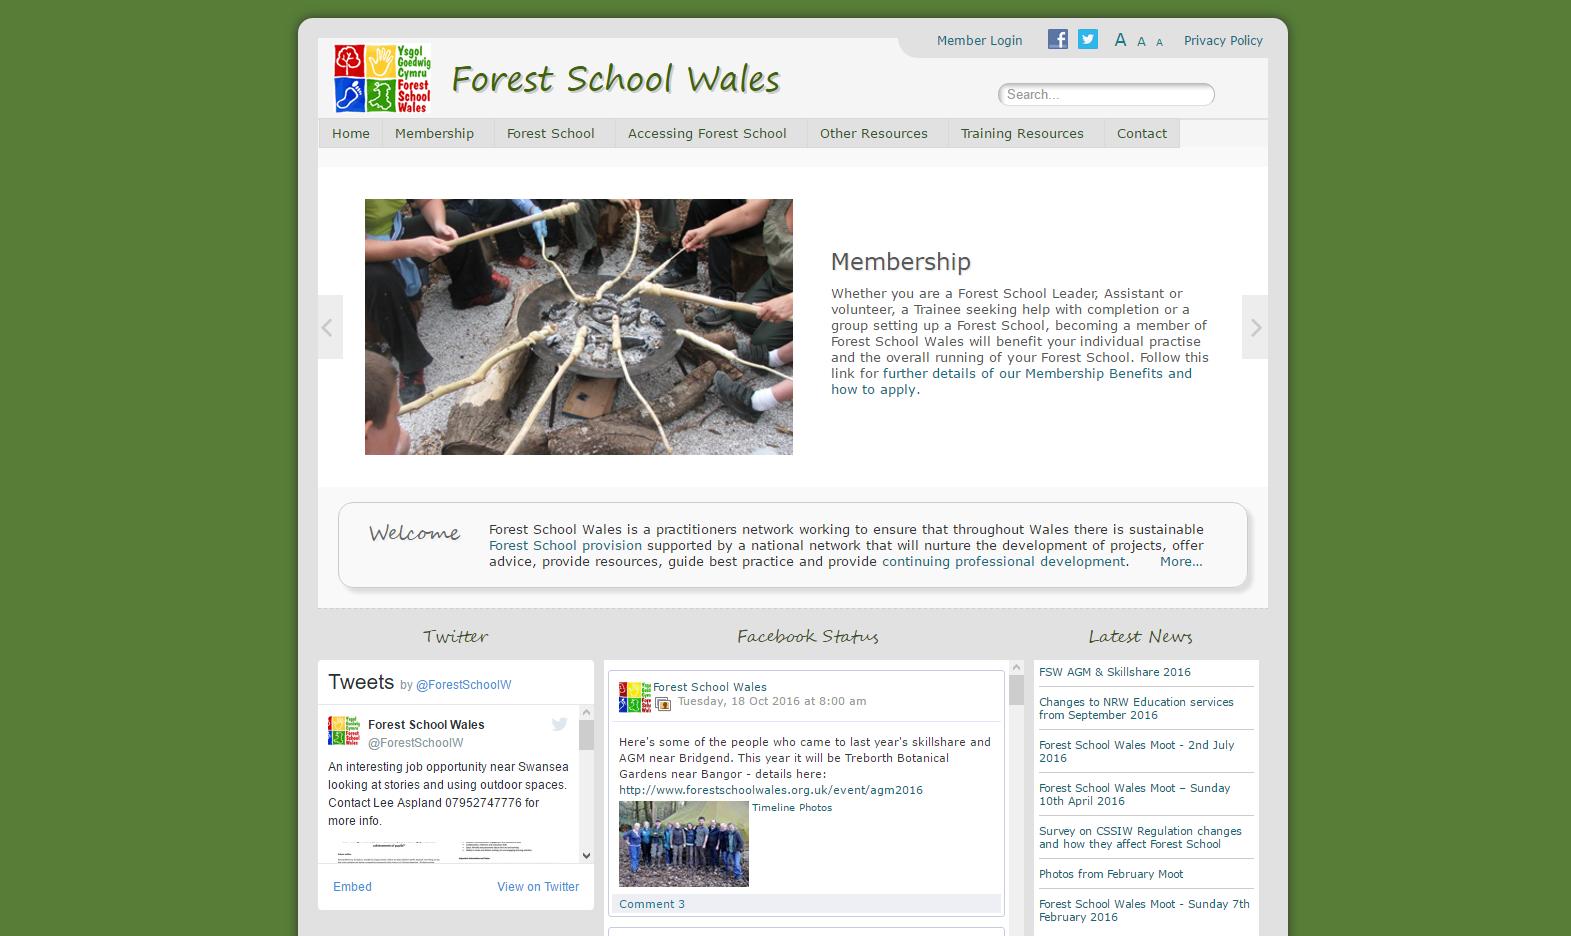 Forest School Wales